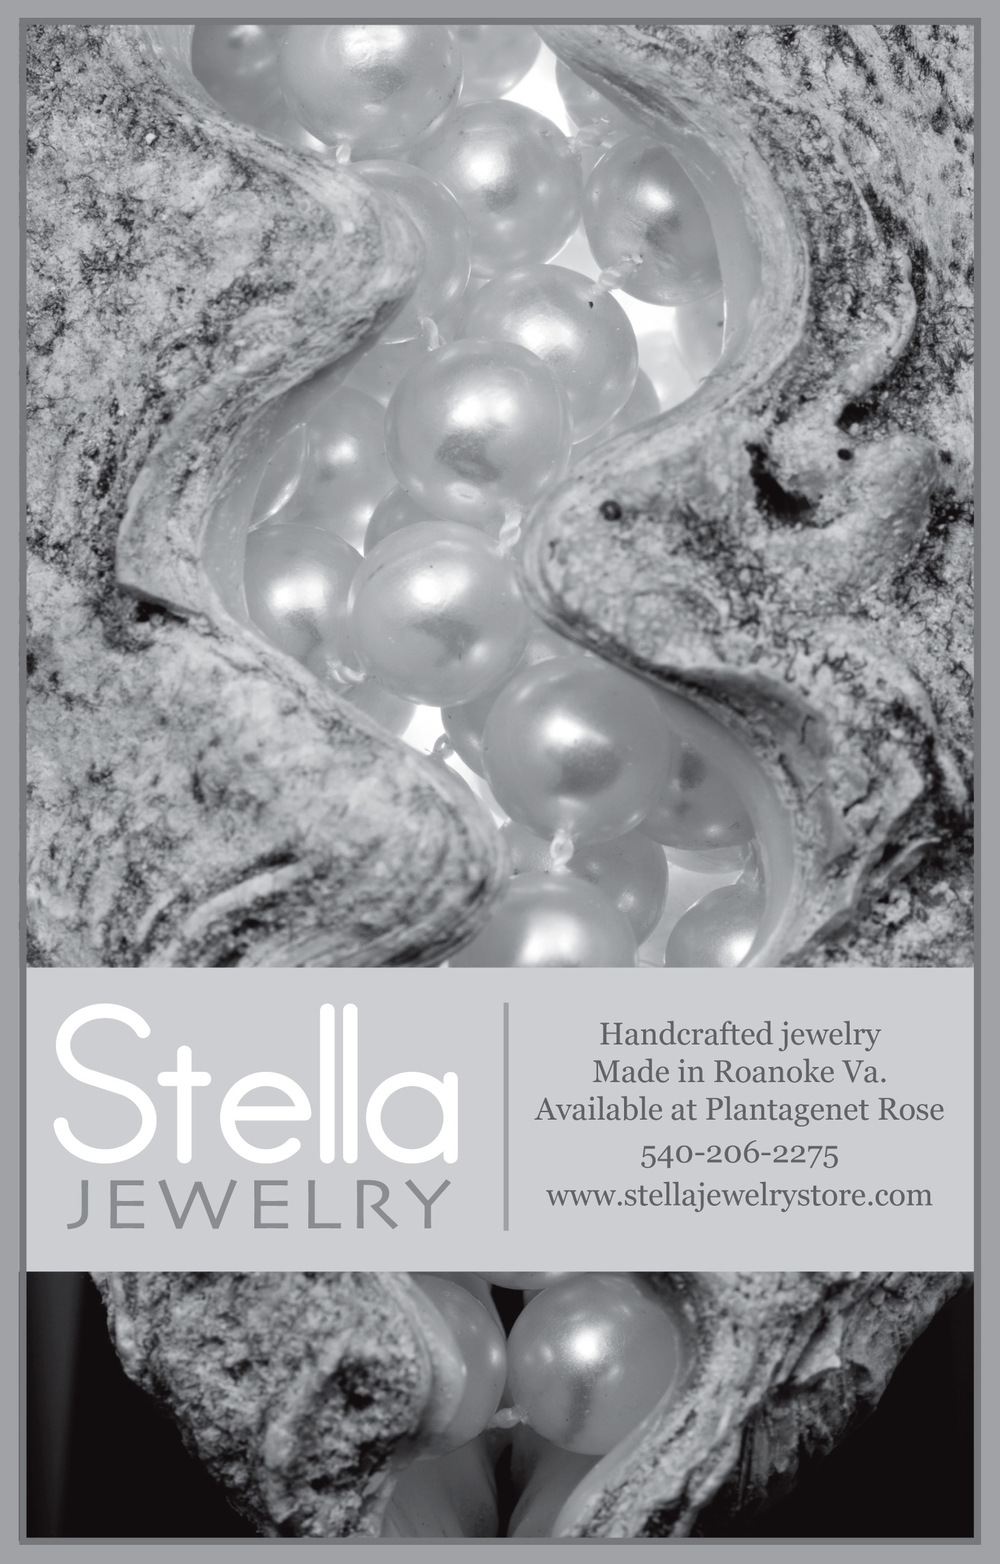 Stella-Star-Newsletter-ad-April-2011.jpg